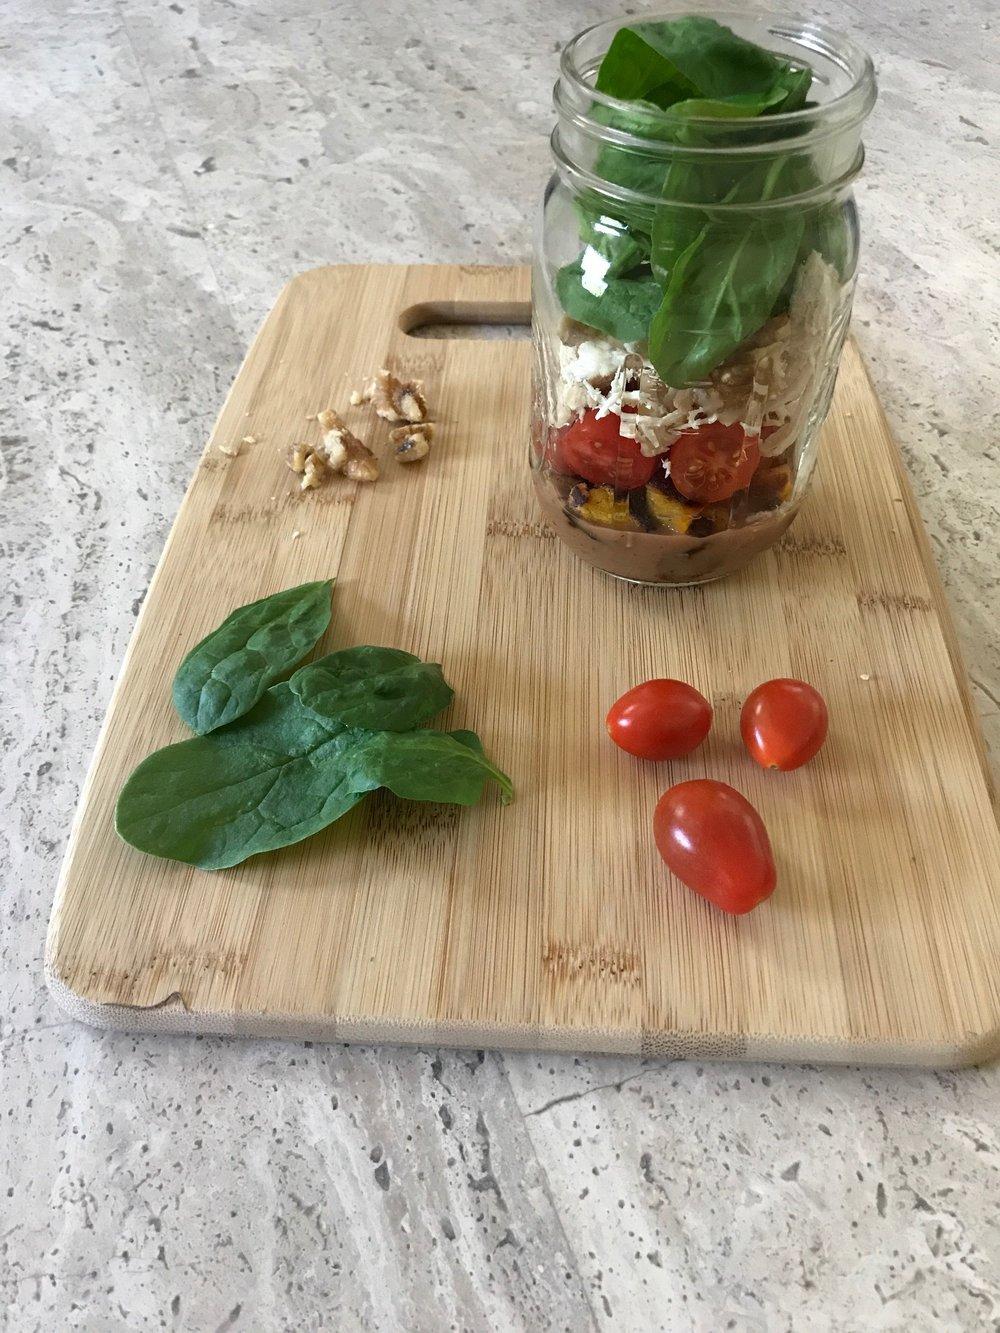 Paleo Salad in a Jar